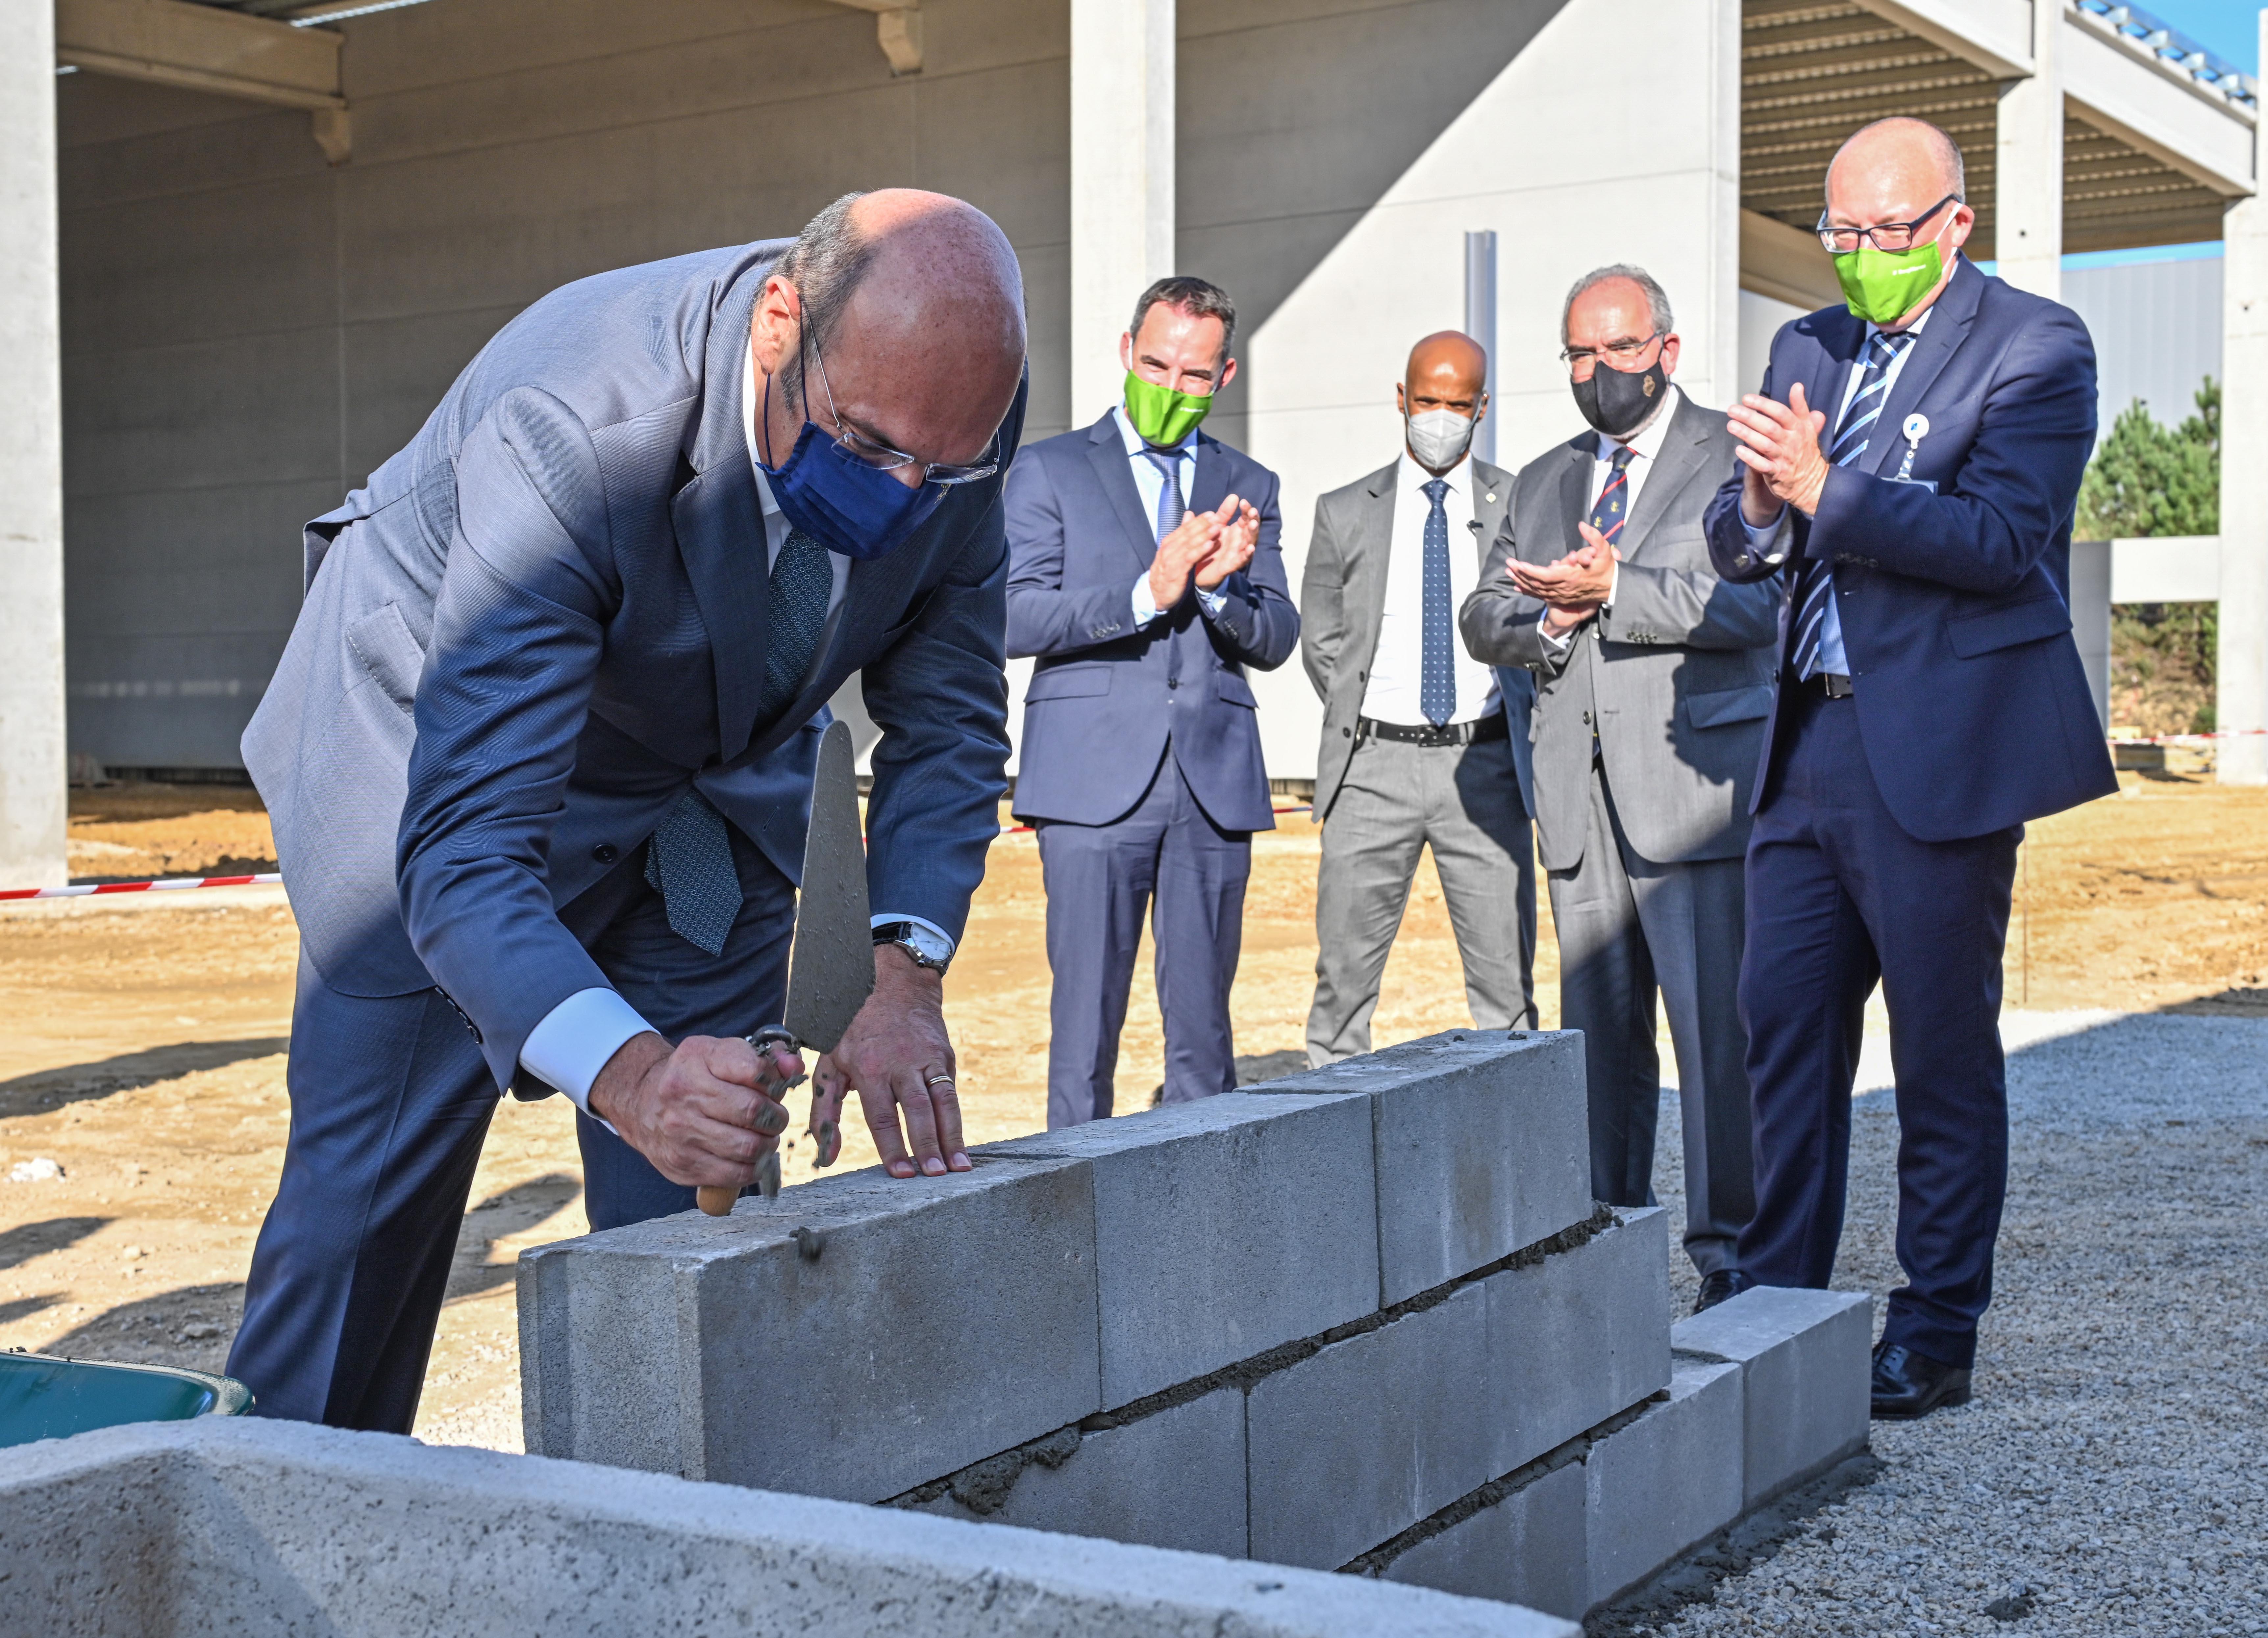 BorgWarner Breaks Ground for New Electrification Plant in Portugal